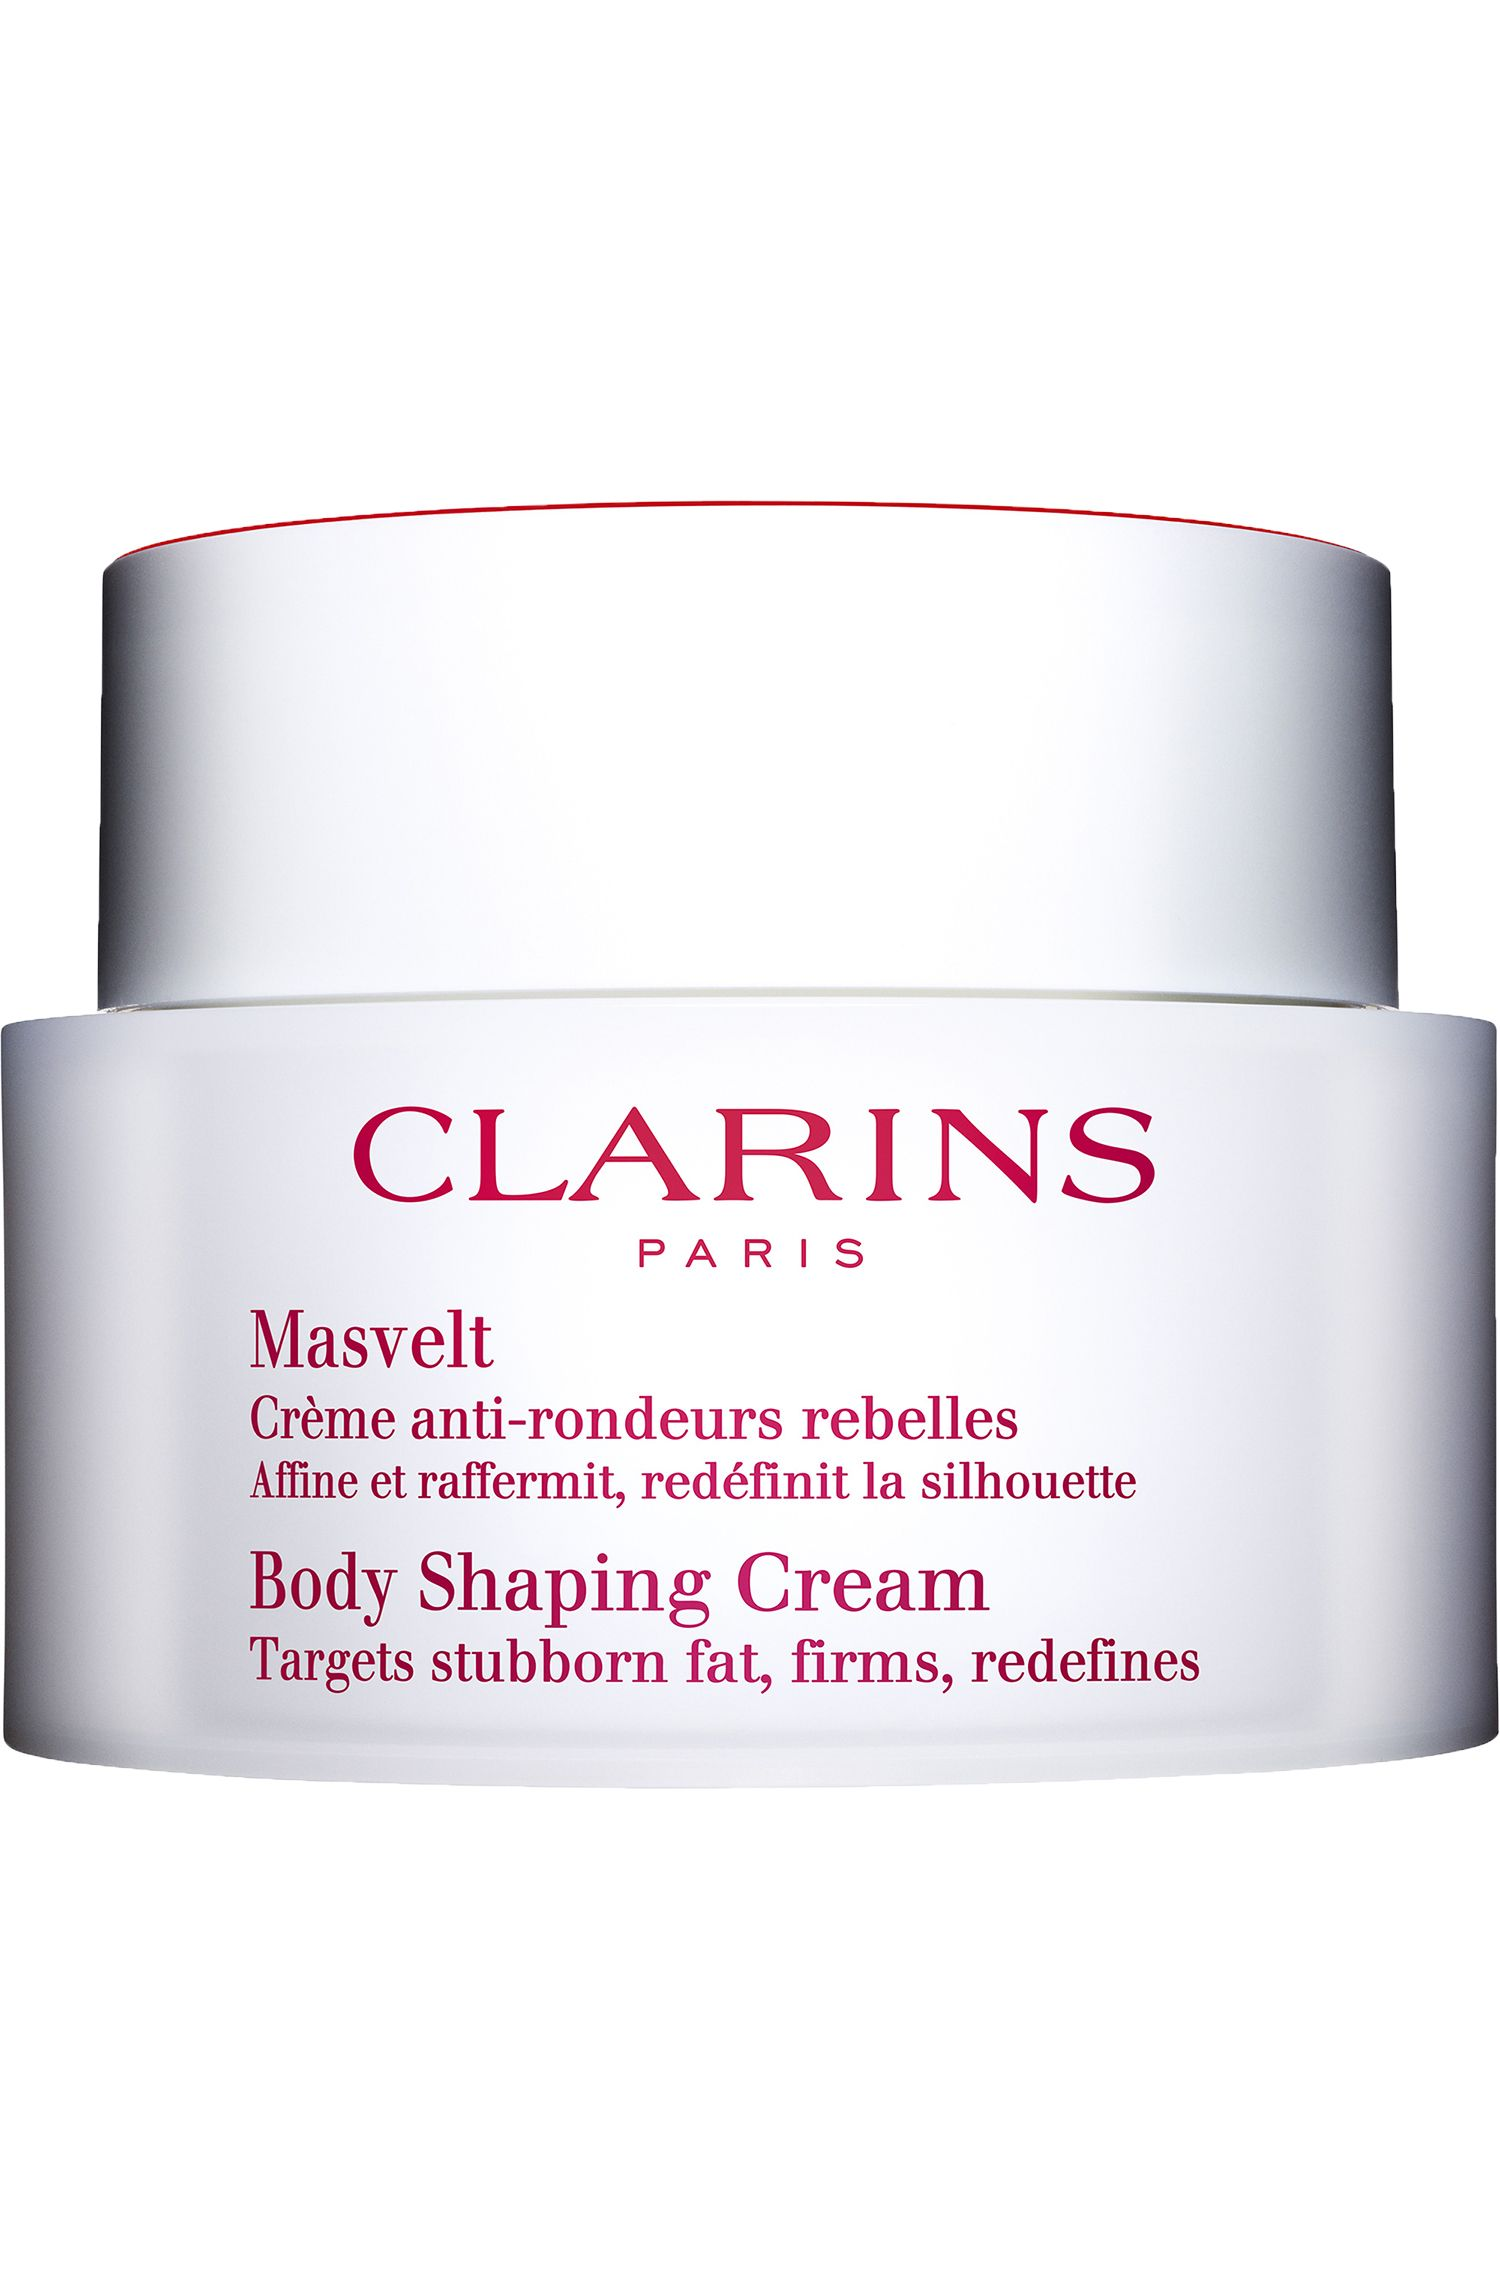 Blissim : Clarins - Crème minceur raffermissante corps Masvelt - Crème minceur raffermissante corps Masvelt